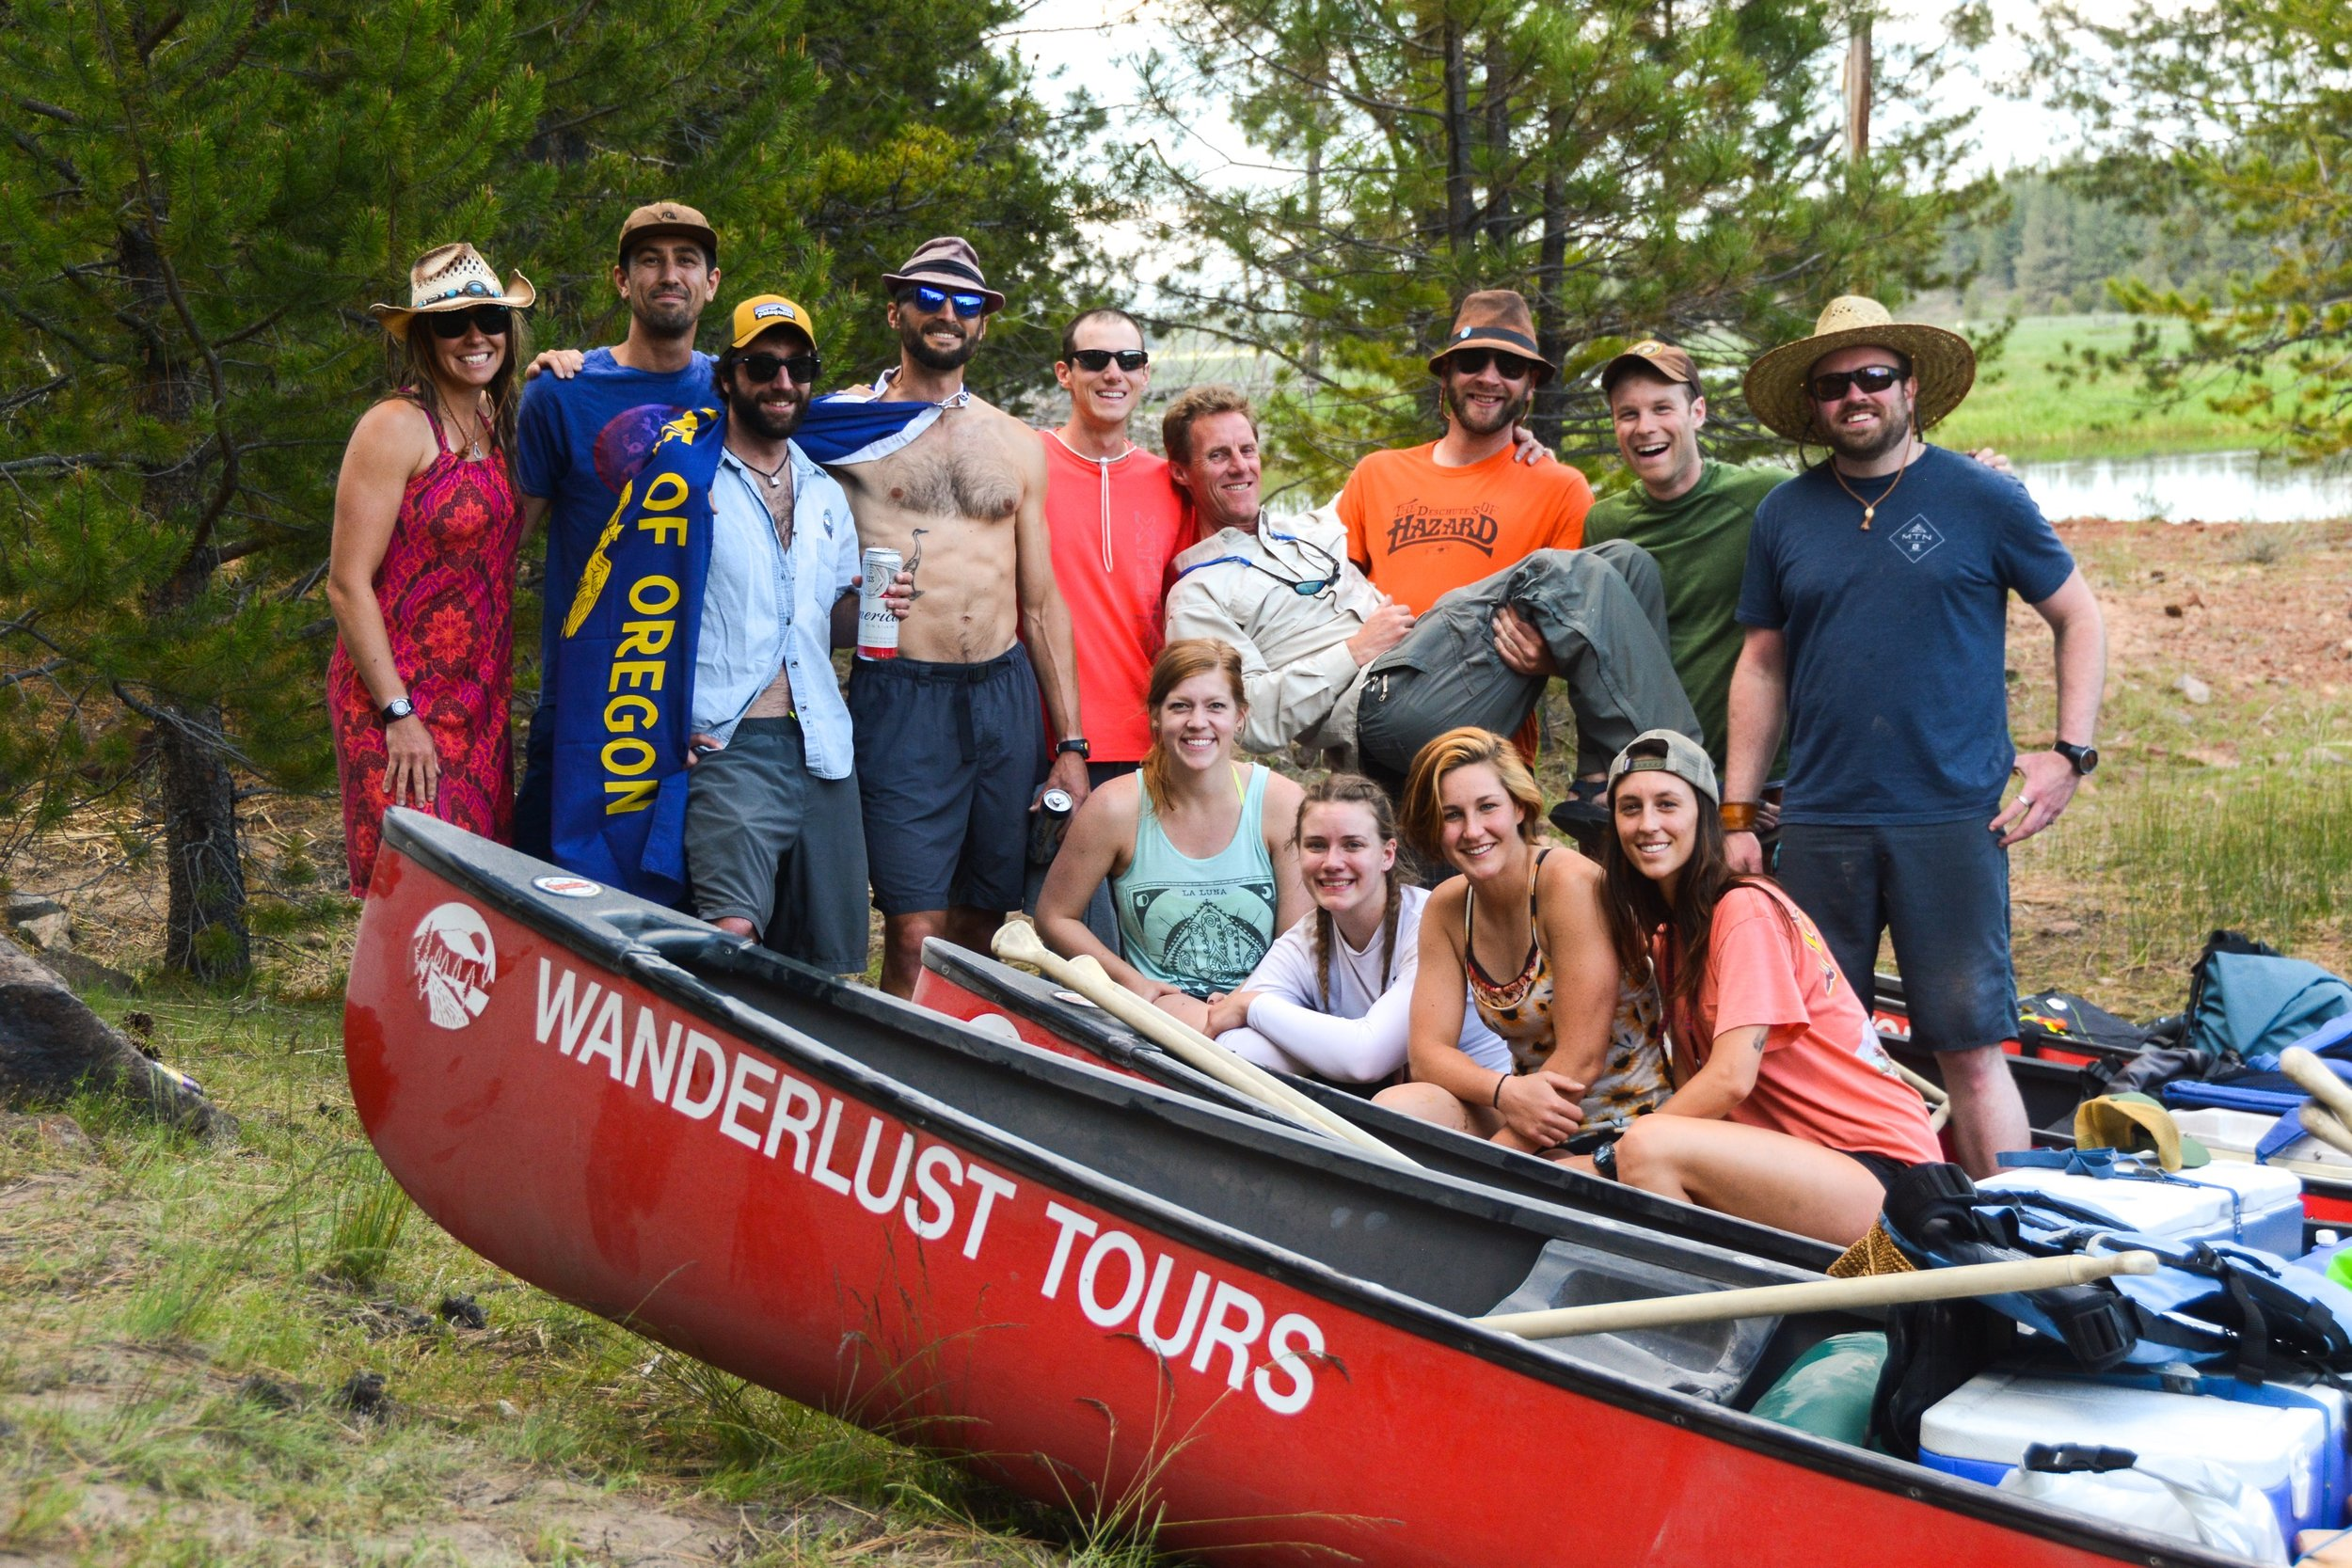 Wanderlust Tours Staff